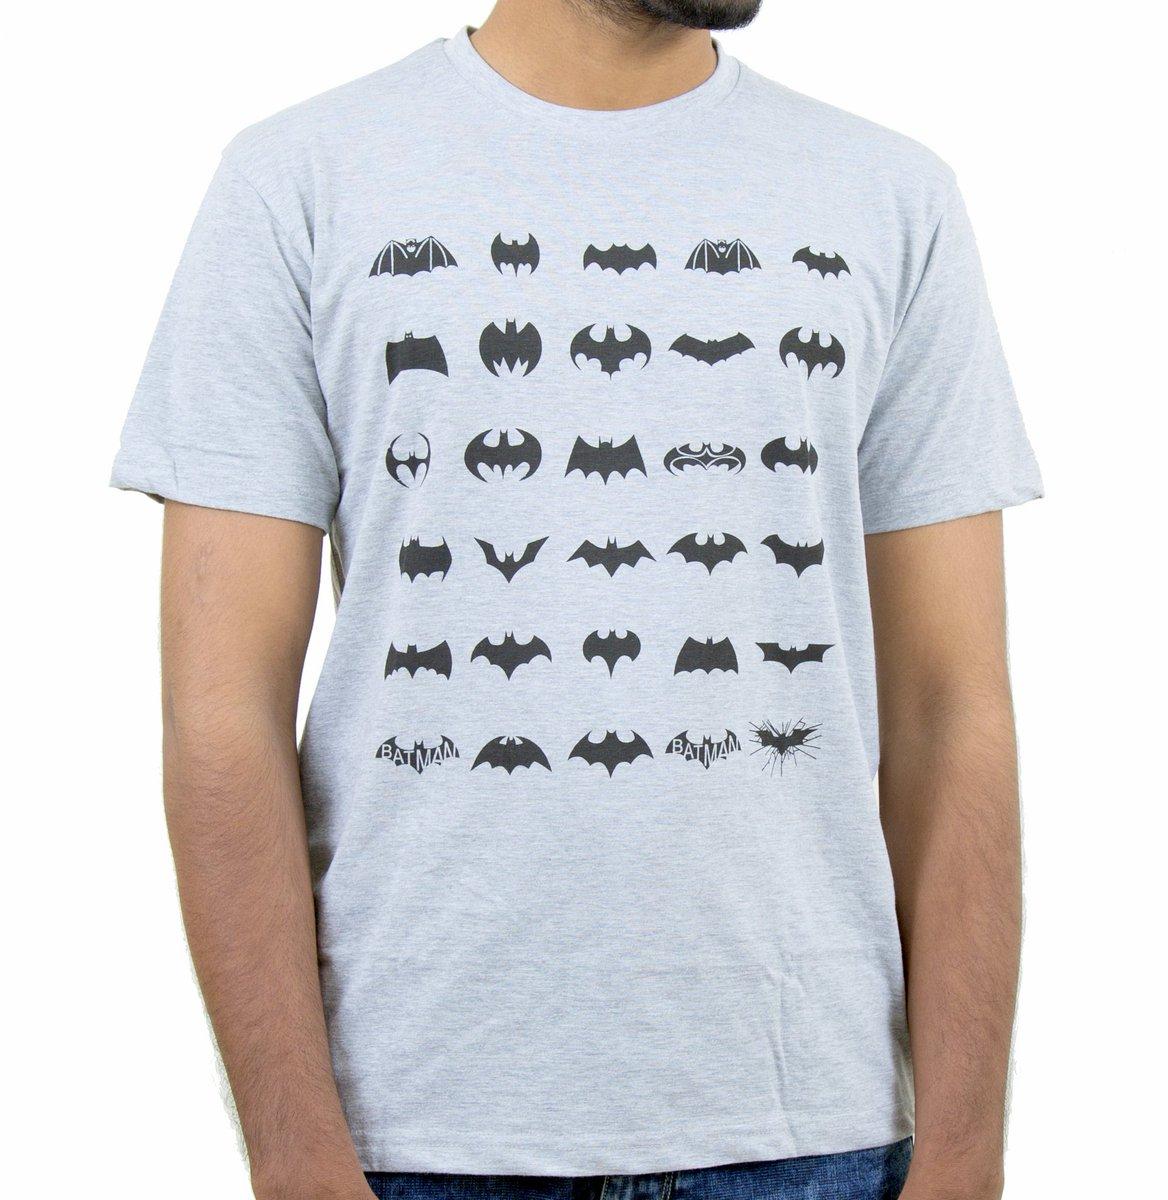 c0684fa9 Indian Aurochs Men Batman Evolution Round Neck T-shirt Buy link: https:/